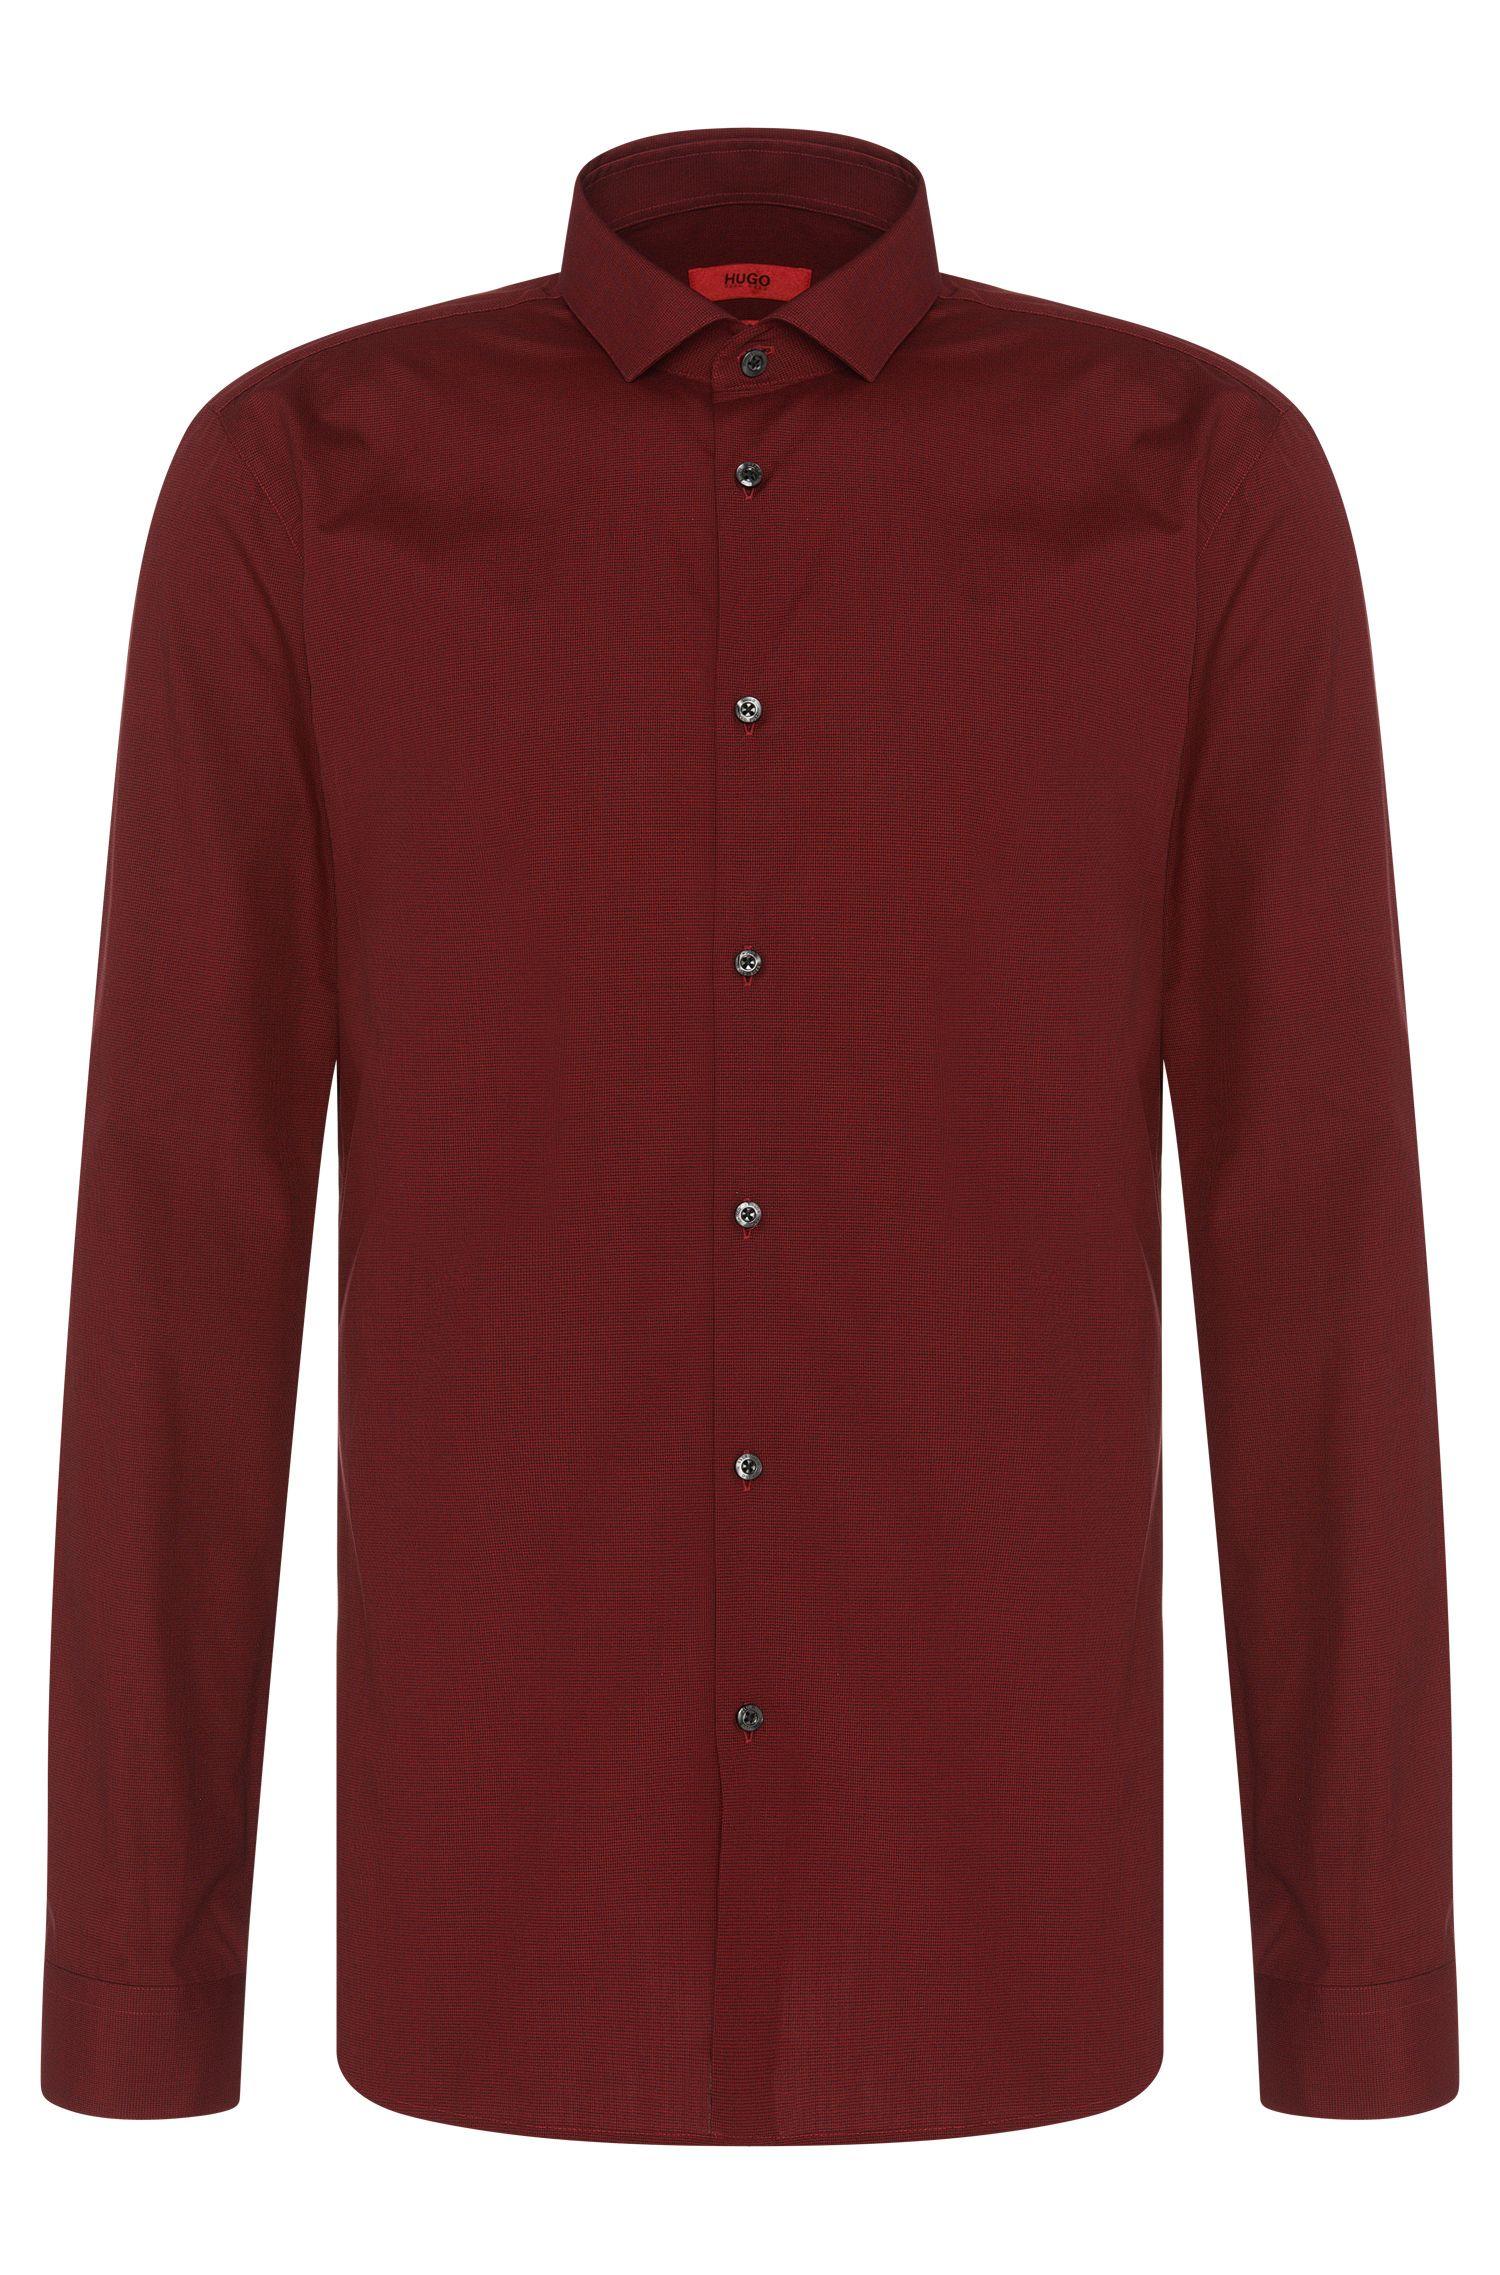 Micro-Houndstooth Cotton Dress Shirt, Extra-Slim Fit | Erondo